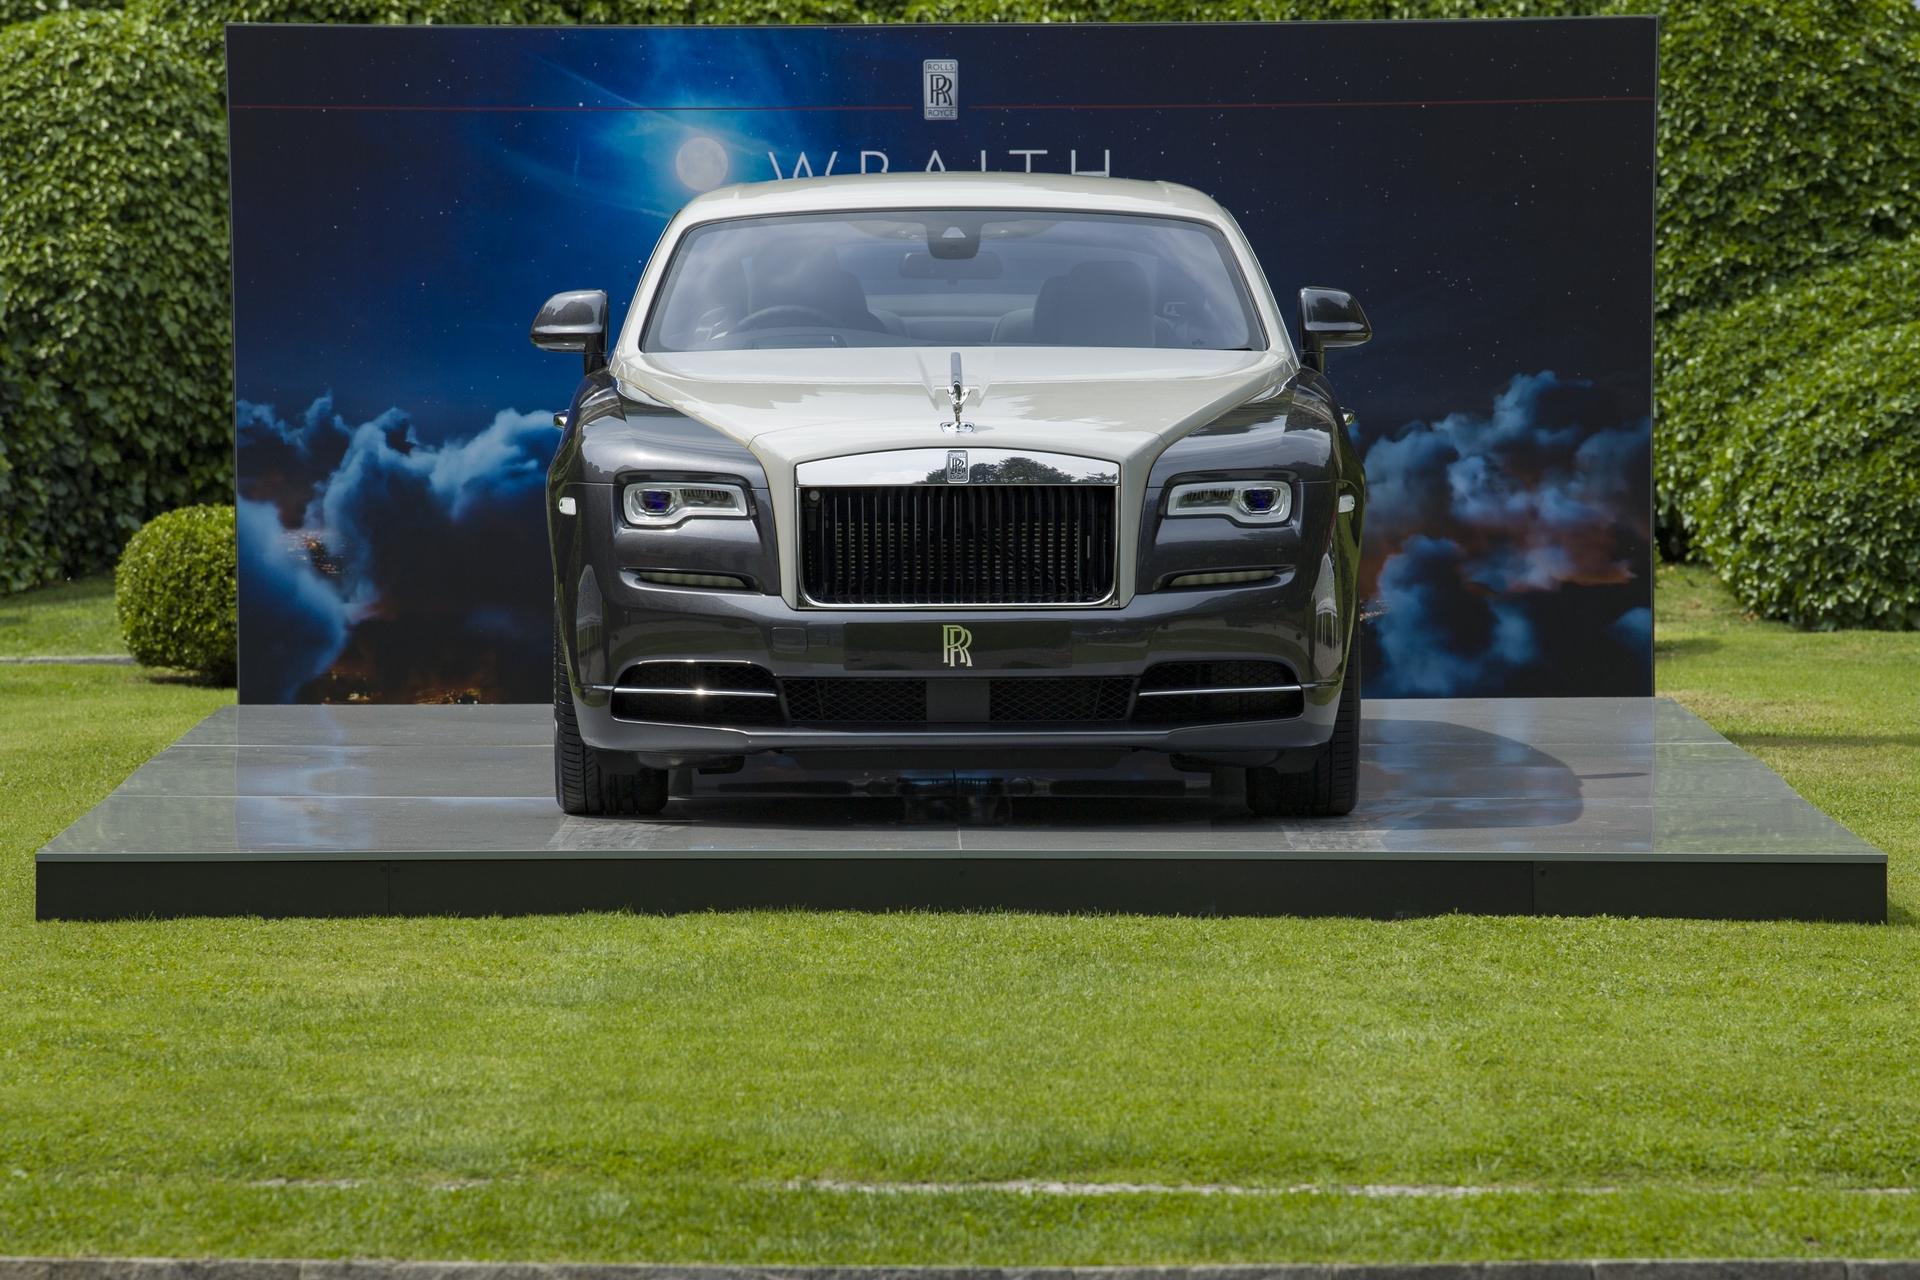 Rolls Royce Wraith Eagle VIII villa deste 01